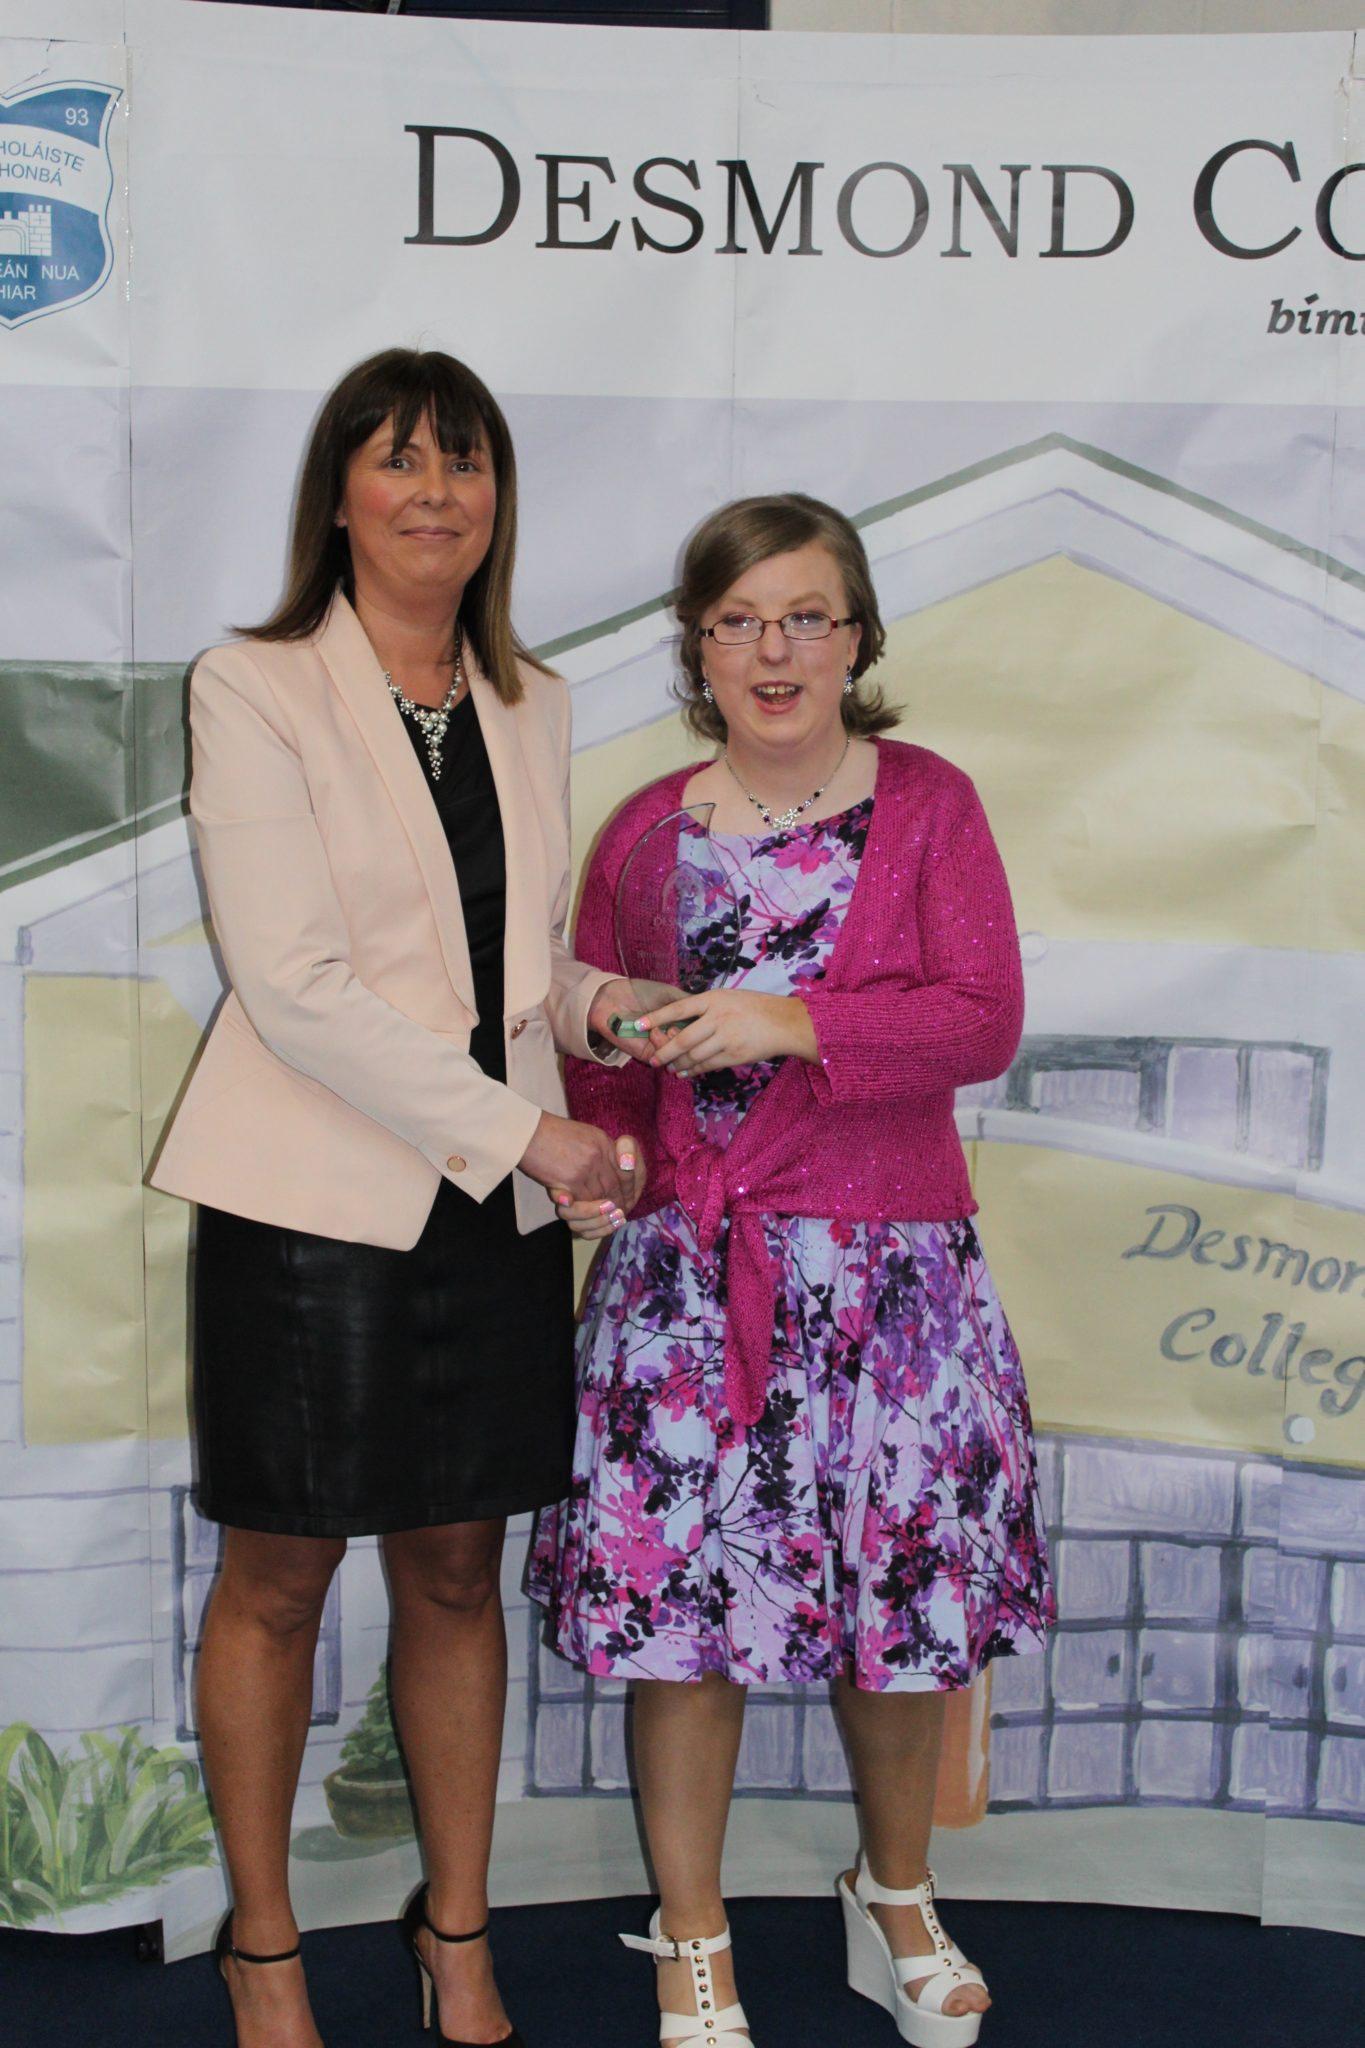 Desmond College Leaving Certificate Graduation 2015: LCA Student of the year Ruth Cregan with Liz Cregan